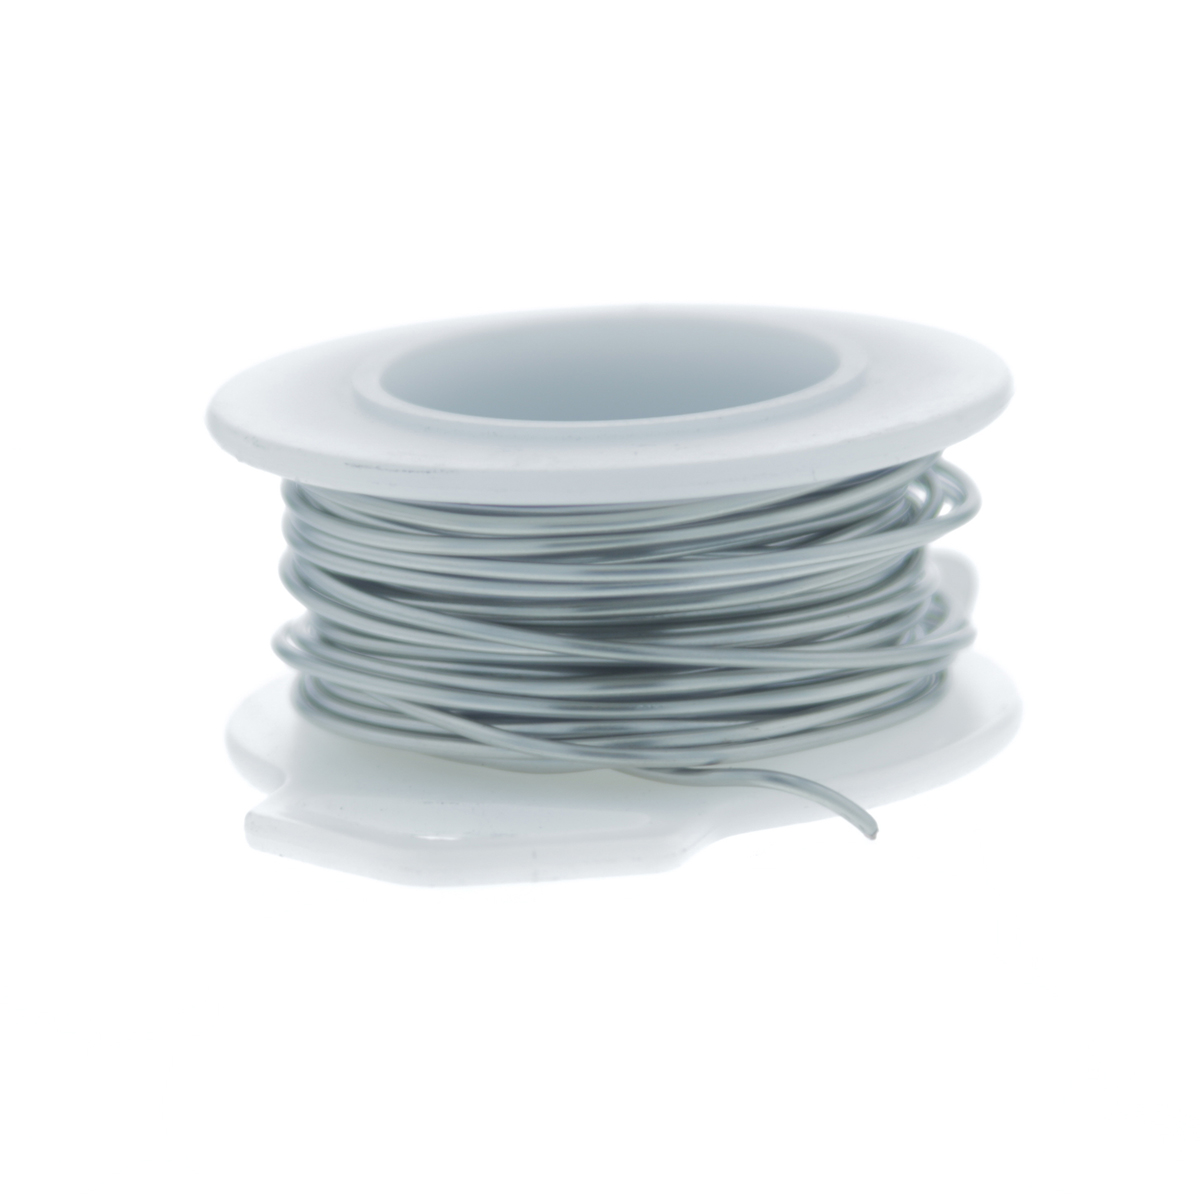 20 Gauge Round Silver Plated Titanium Copper Craft Wire - 25 ft ...